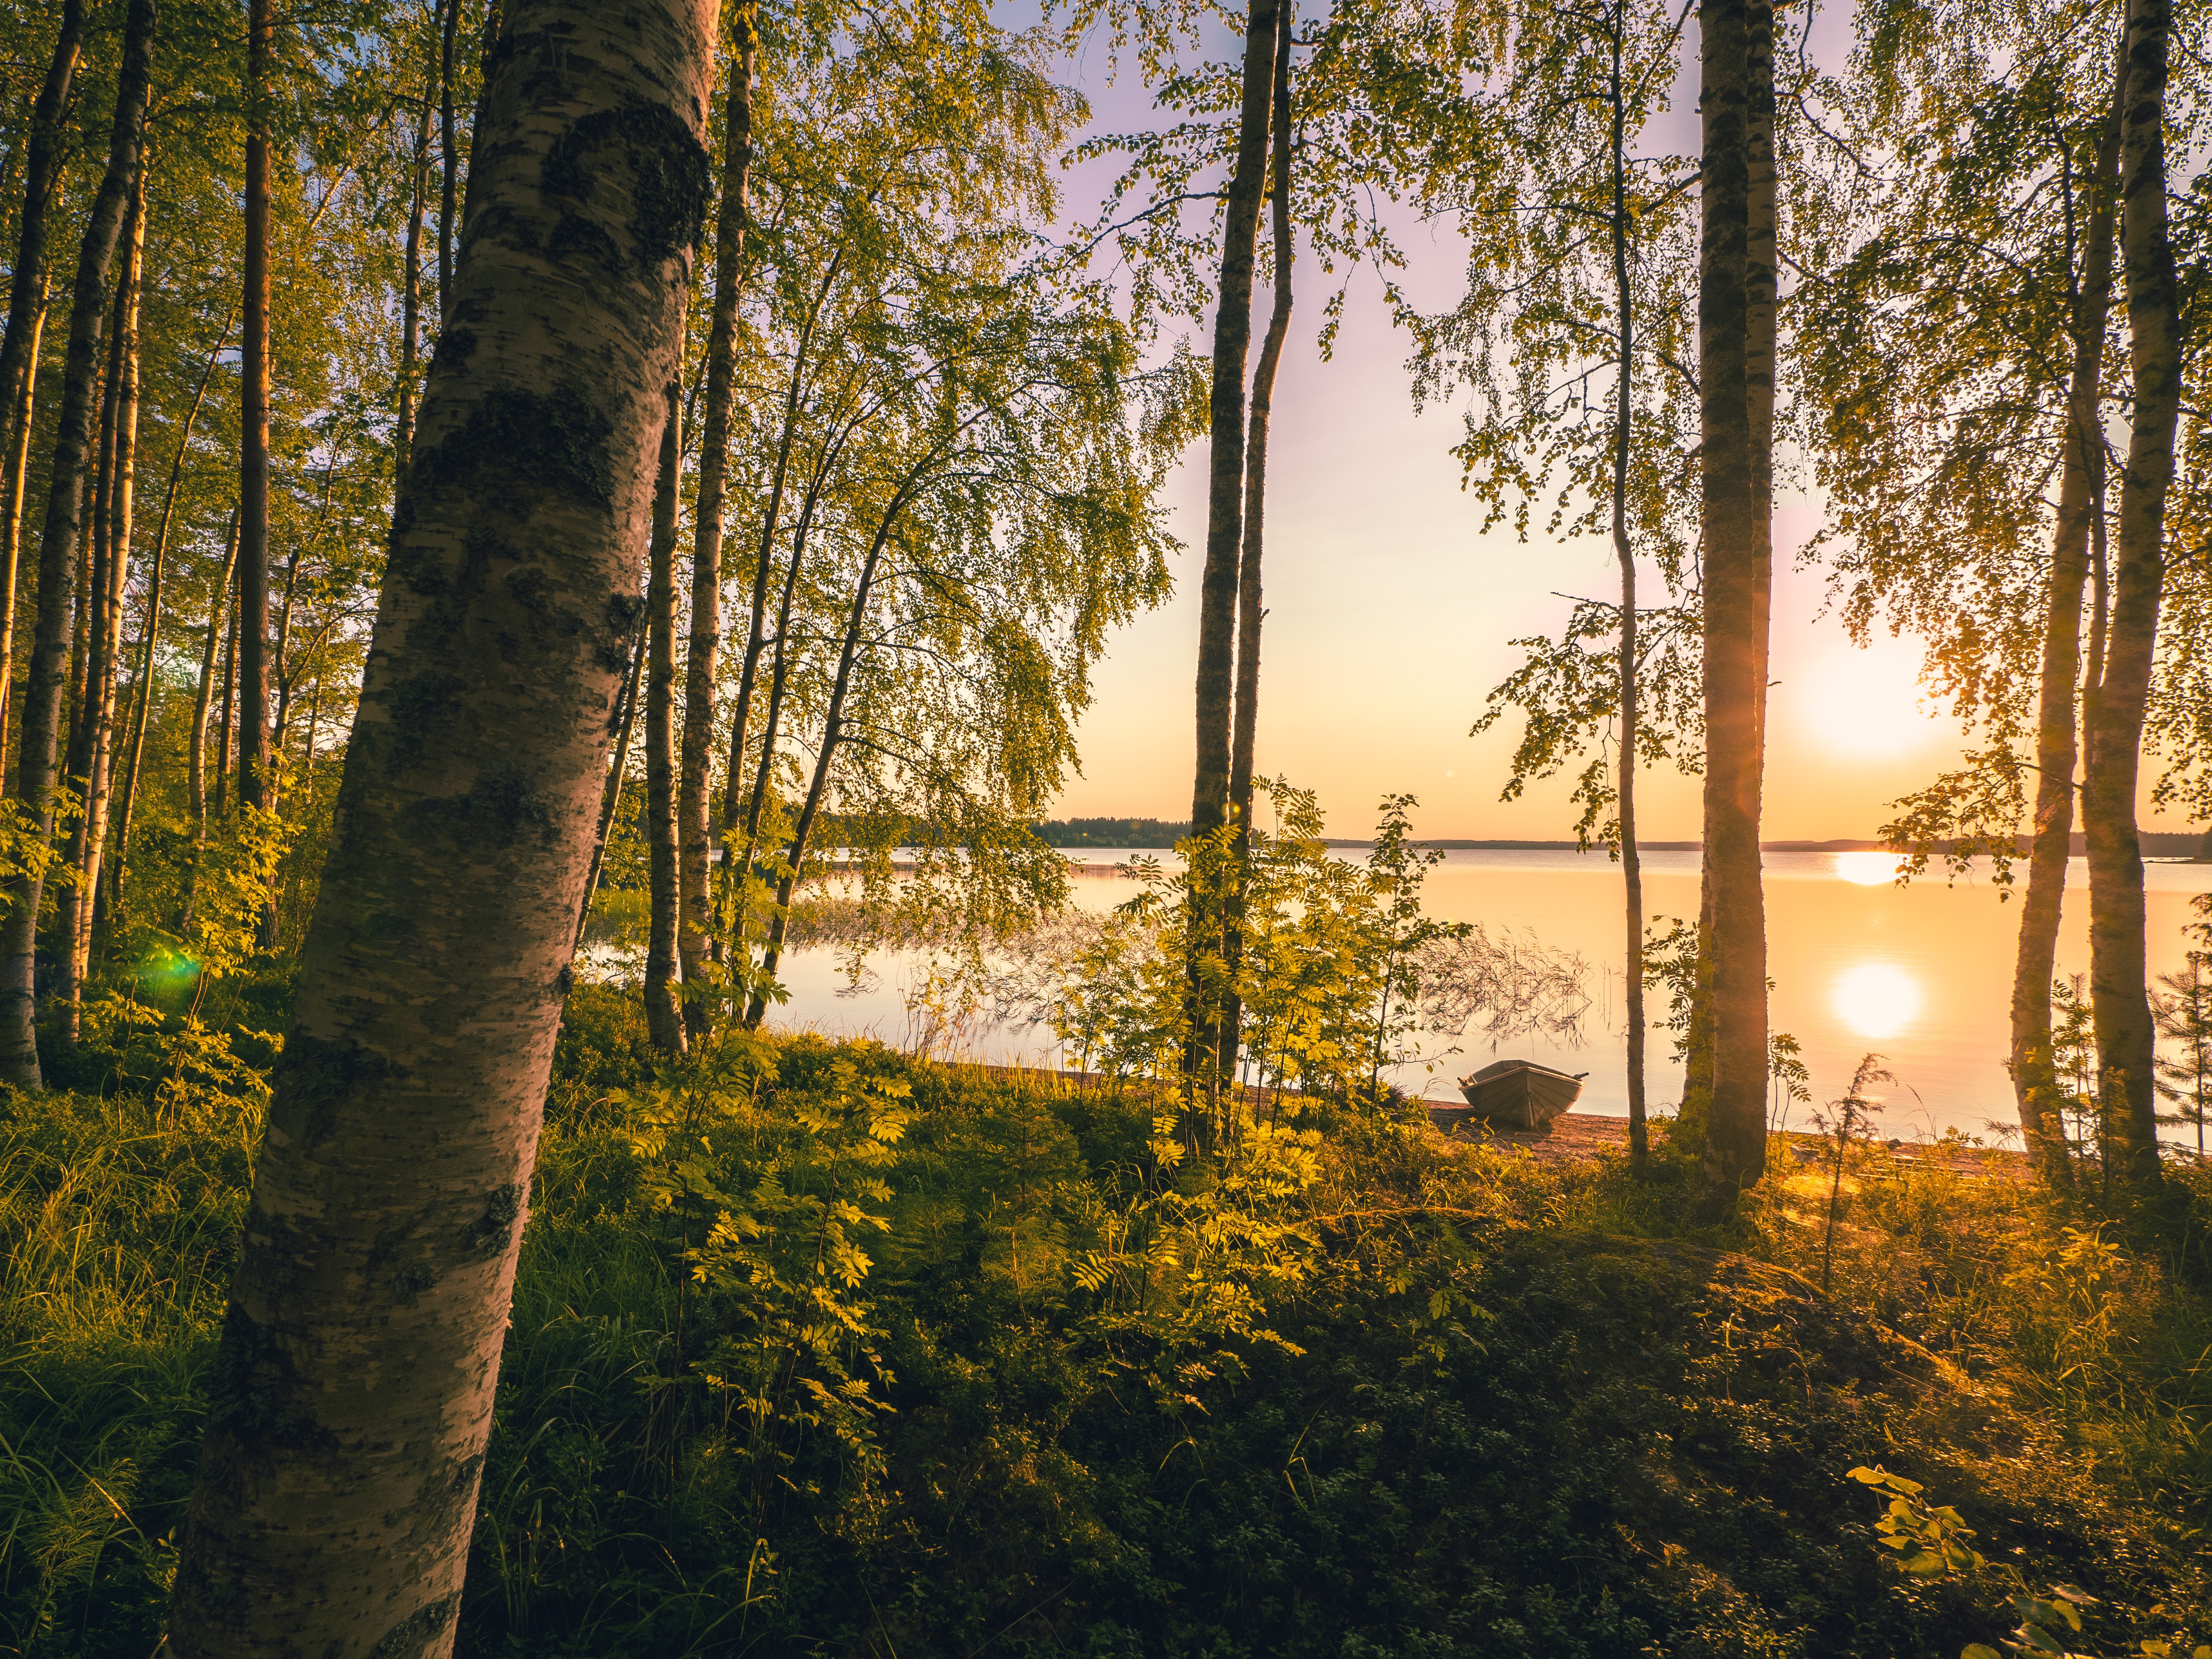 Fresh air in a fresh forest